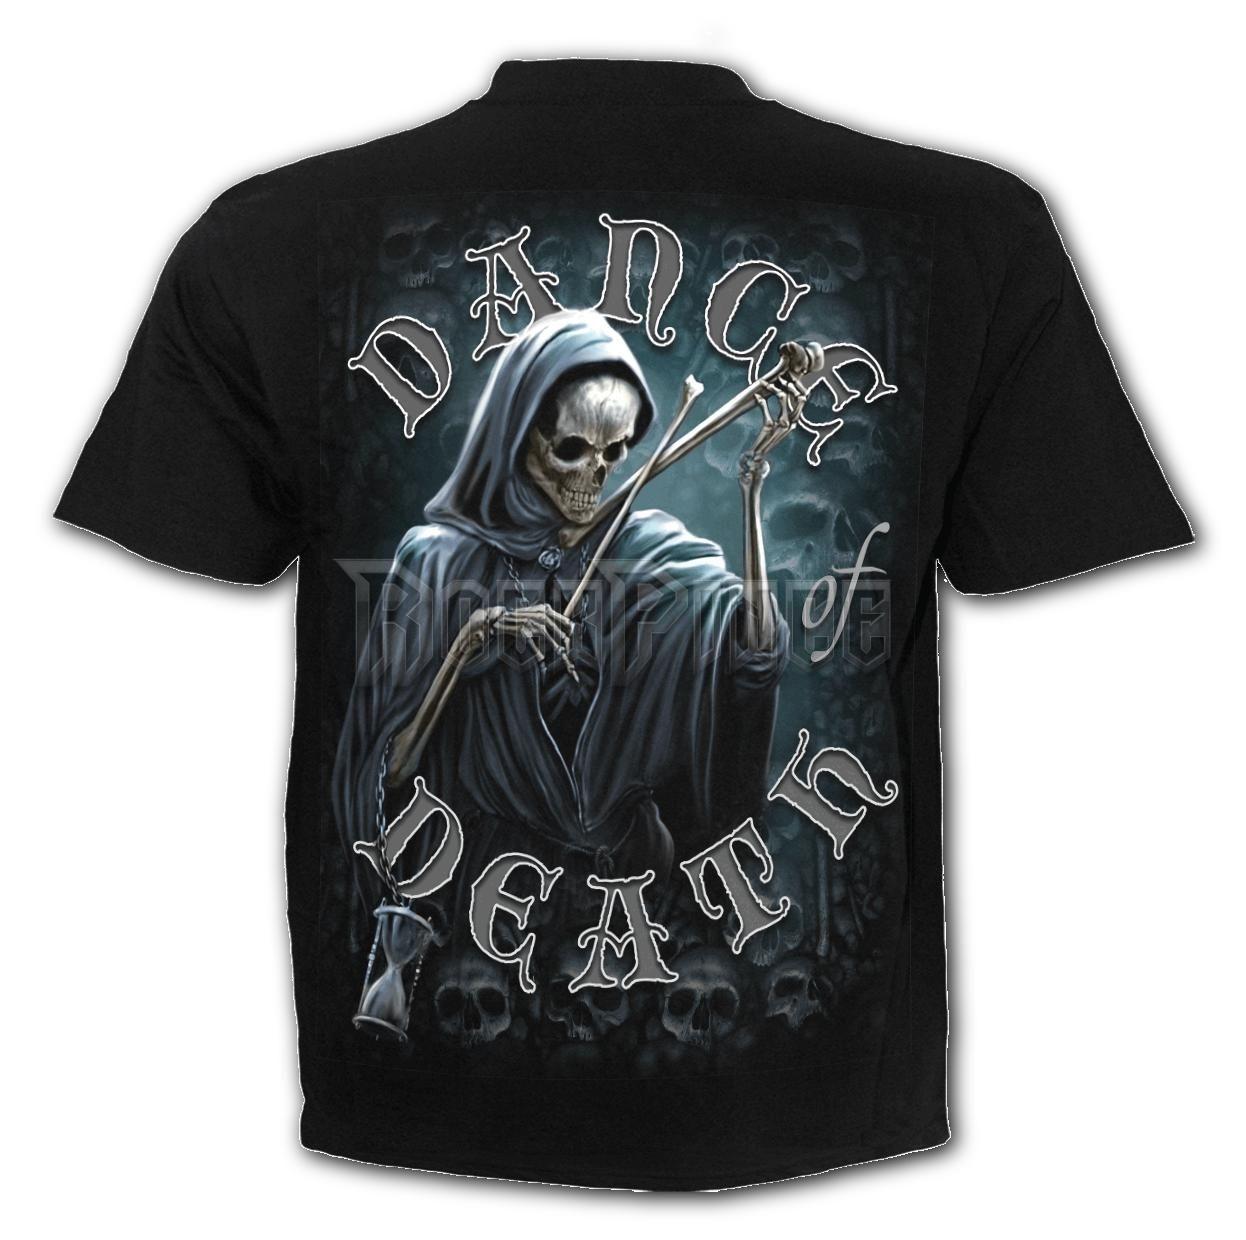 DANCE OF DEATH - T-Shirt Black - K068M101